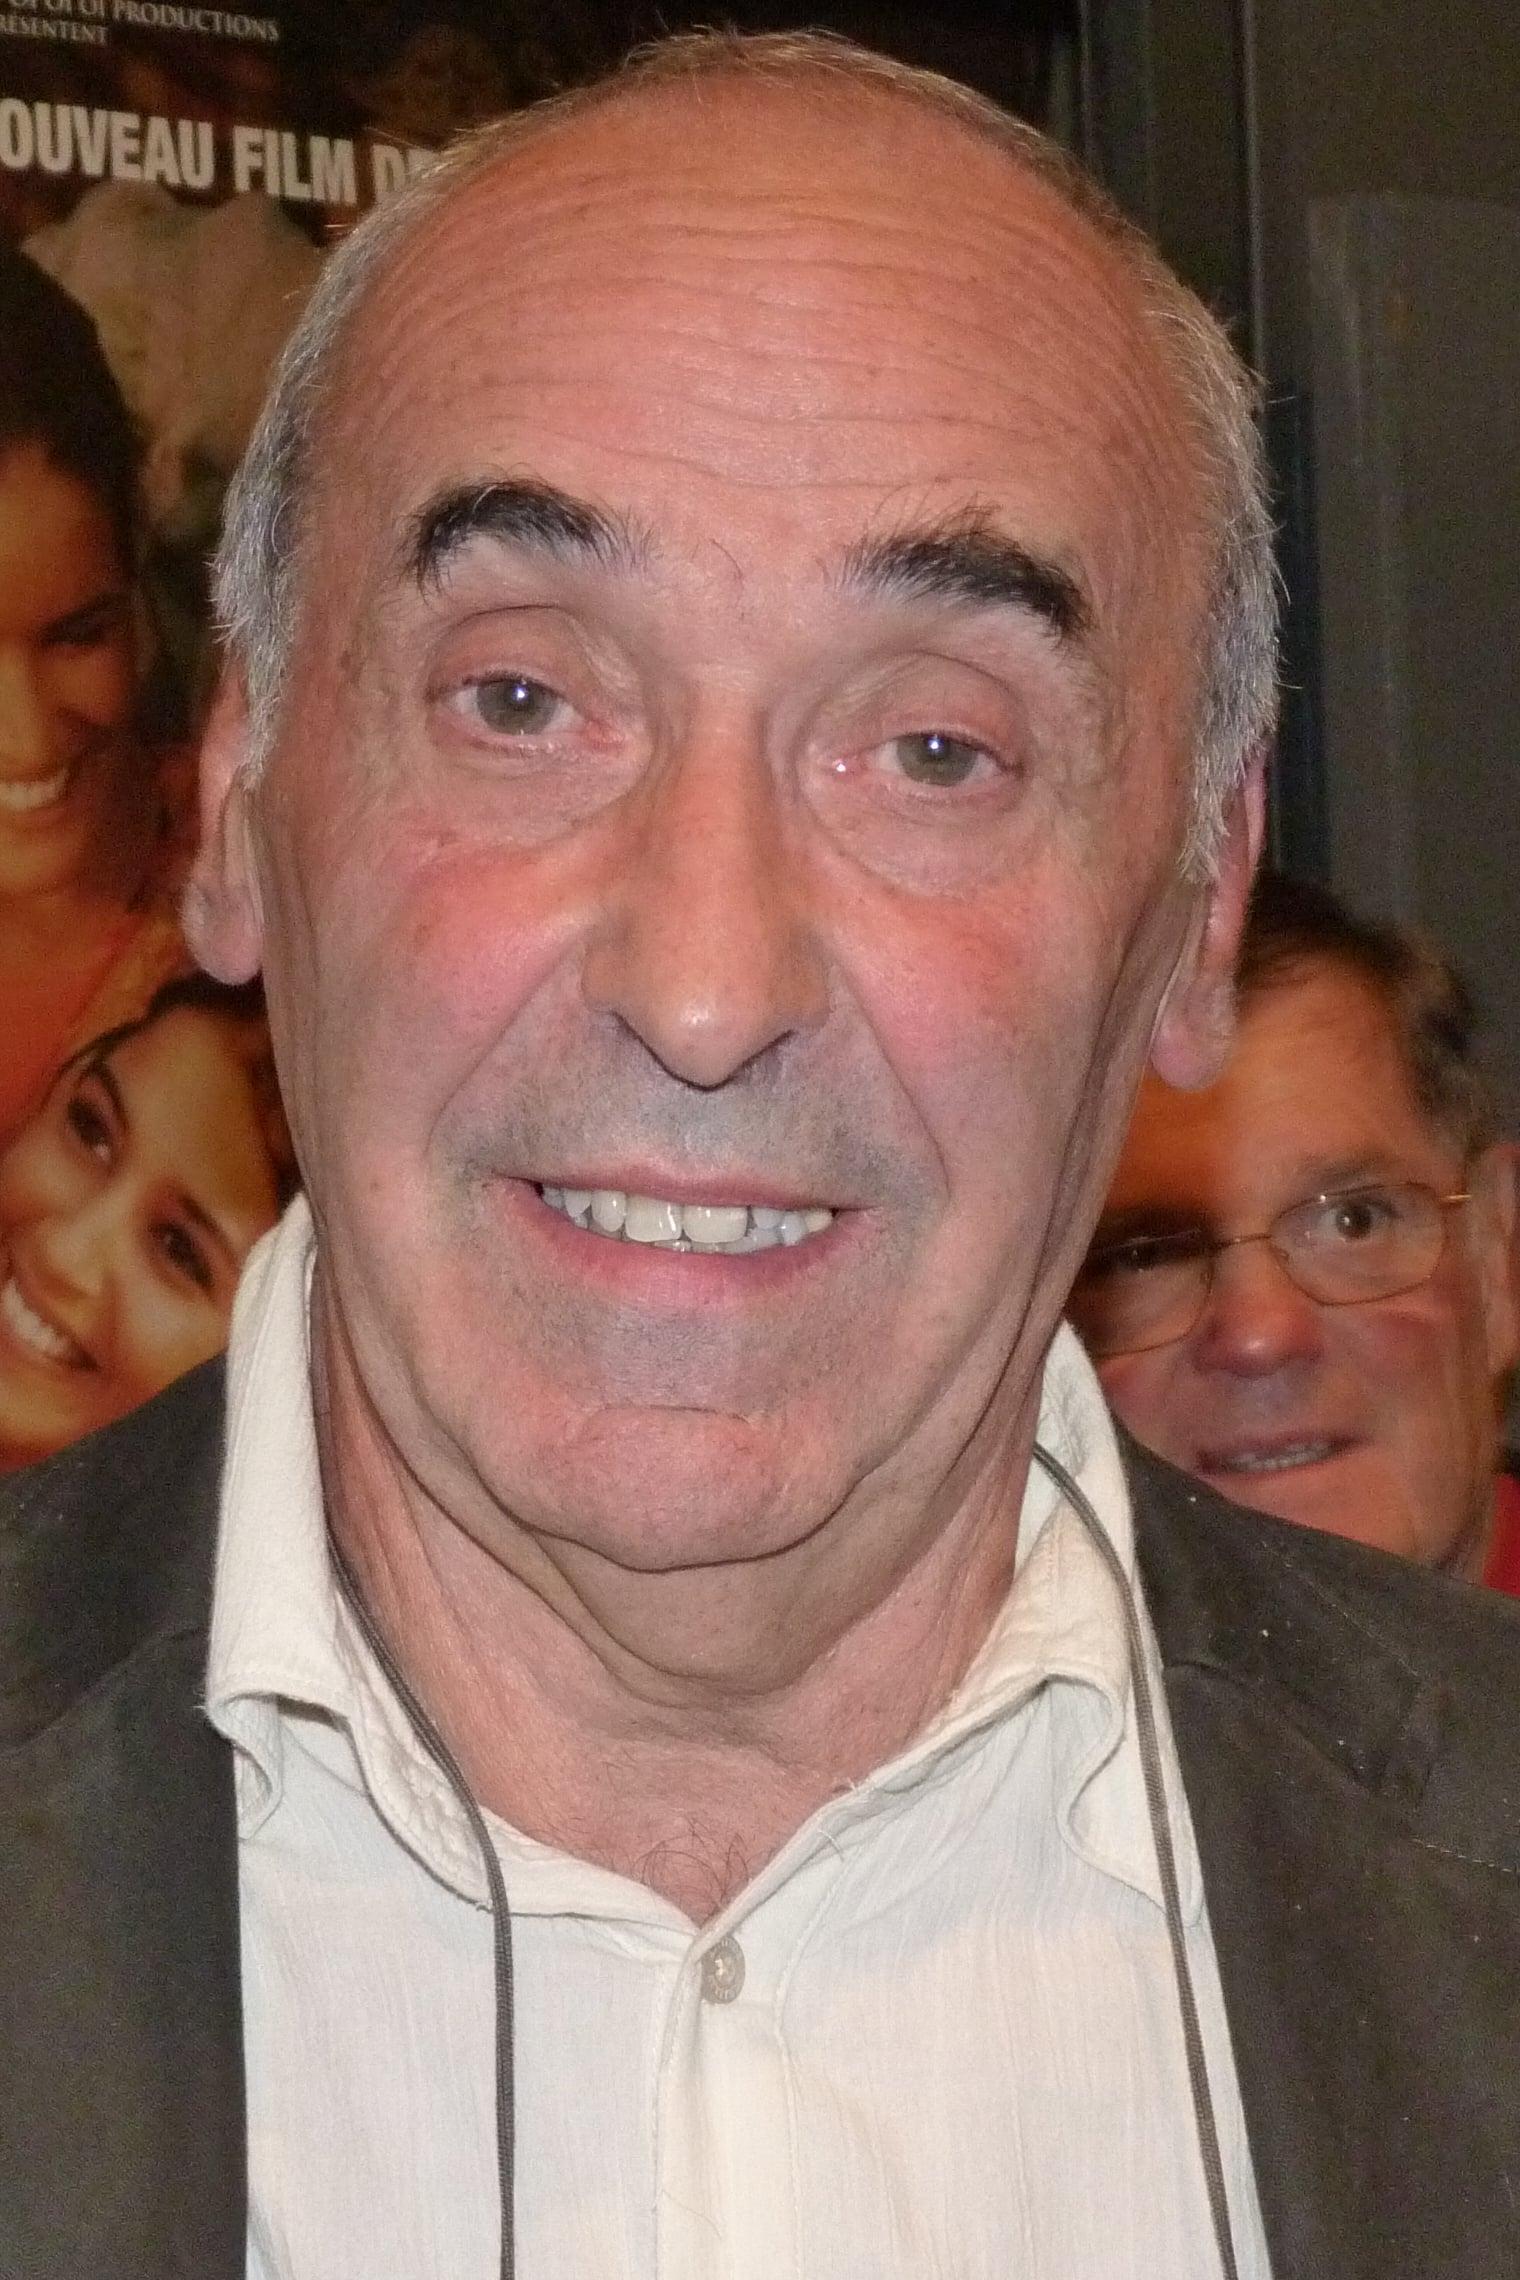 Alain-Michel Blanc